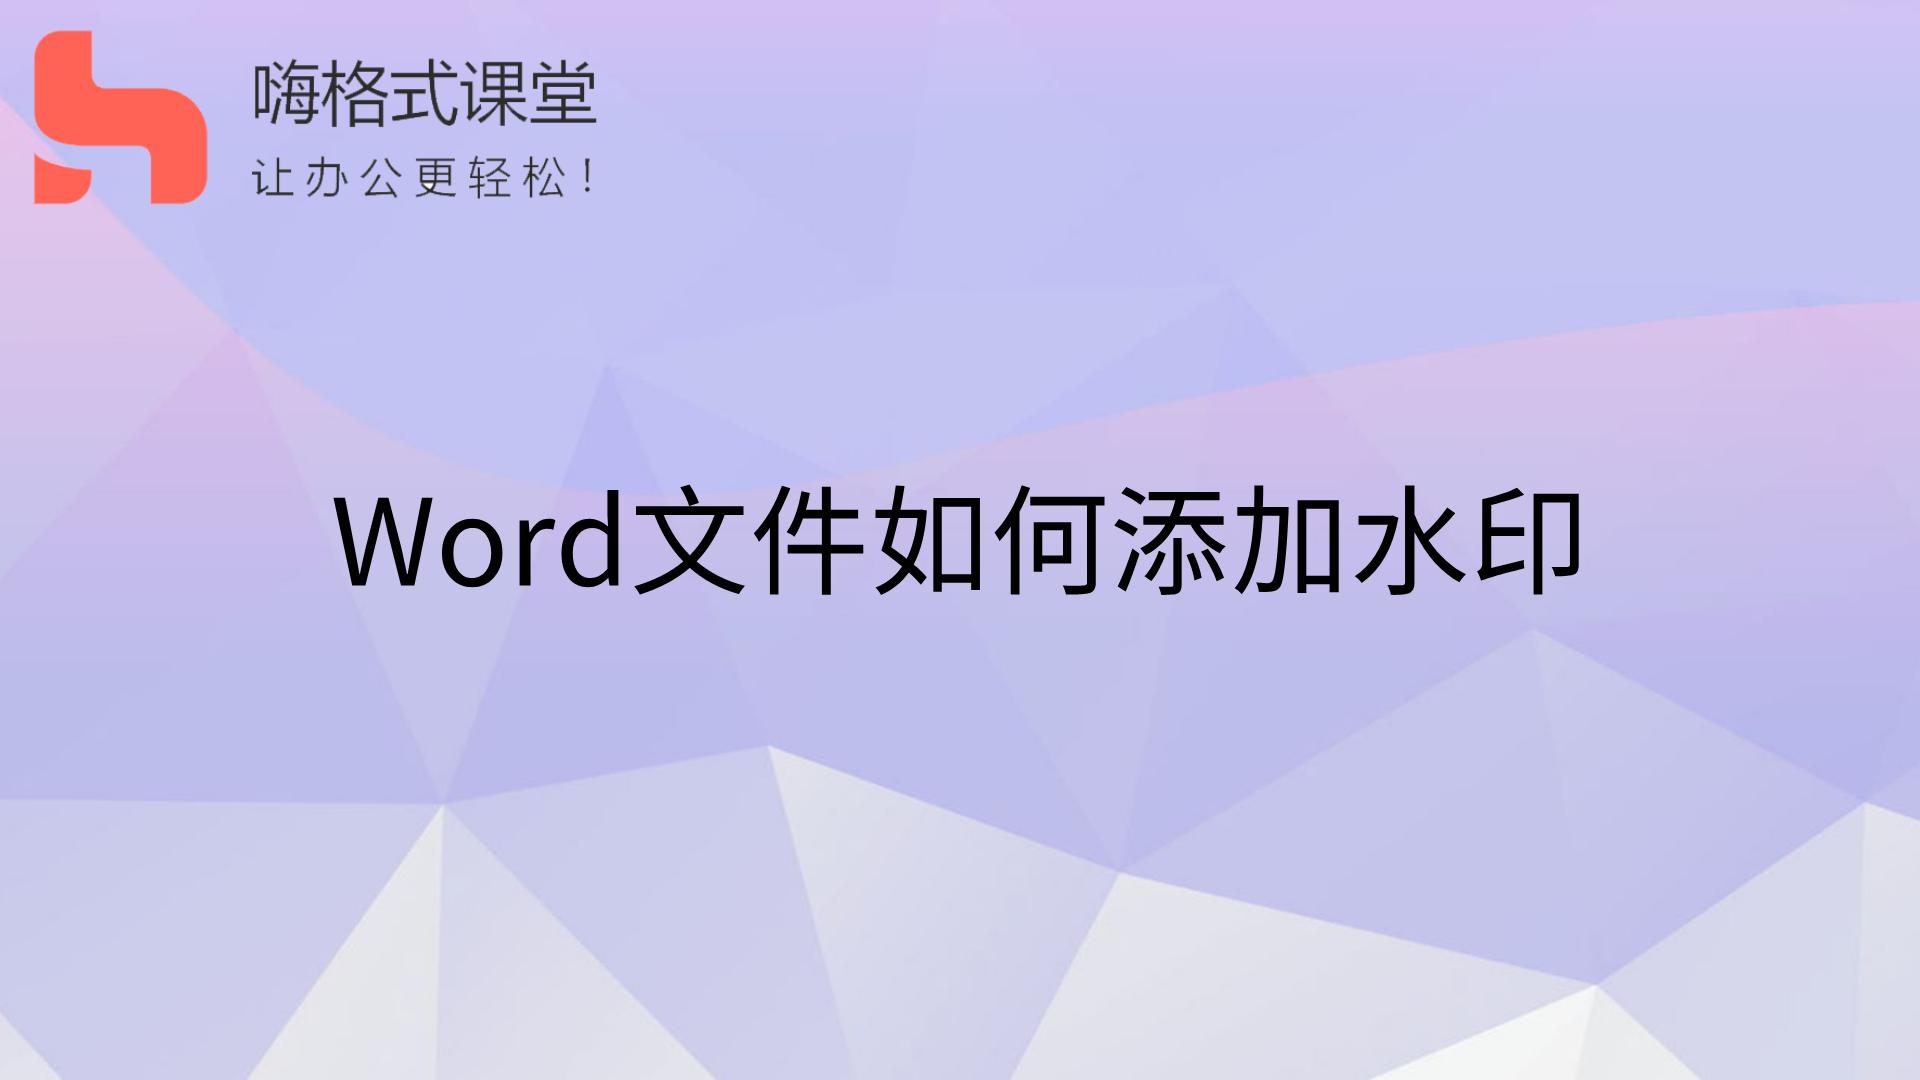 Word文件如何添加水印s